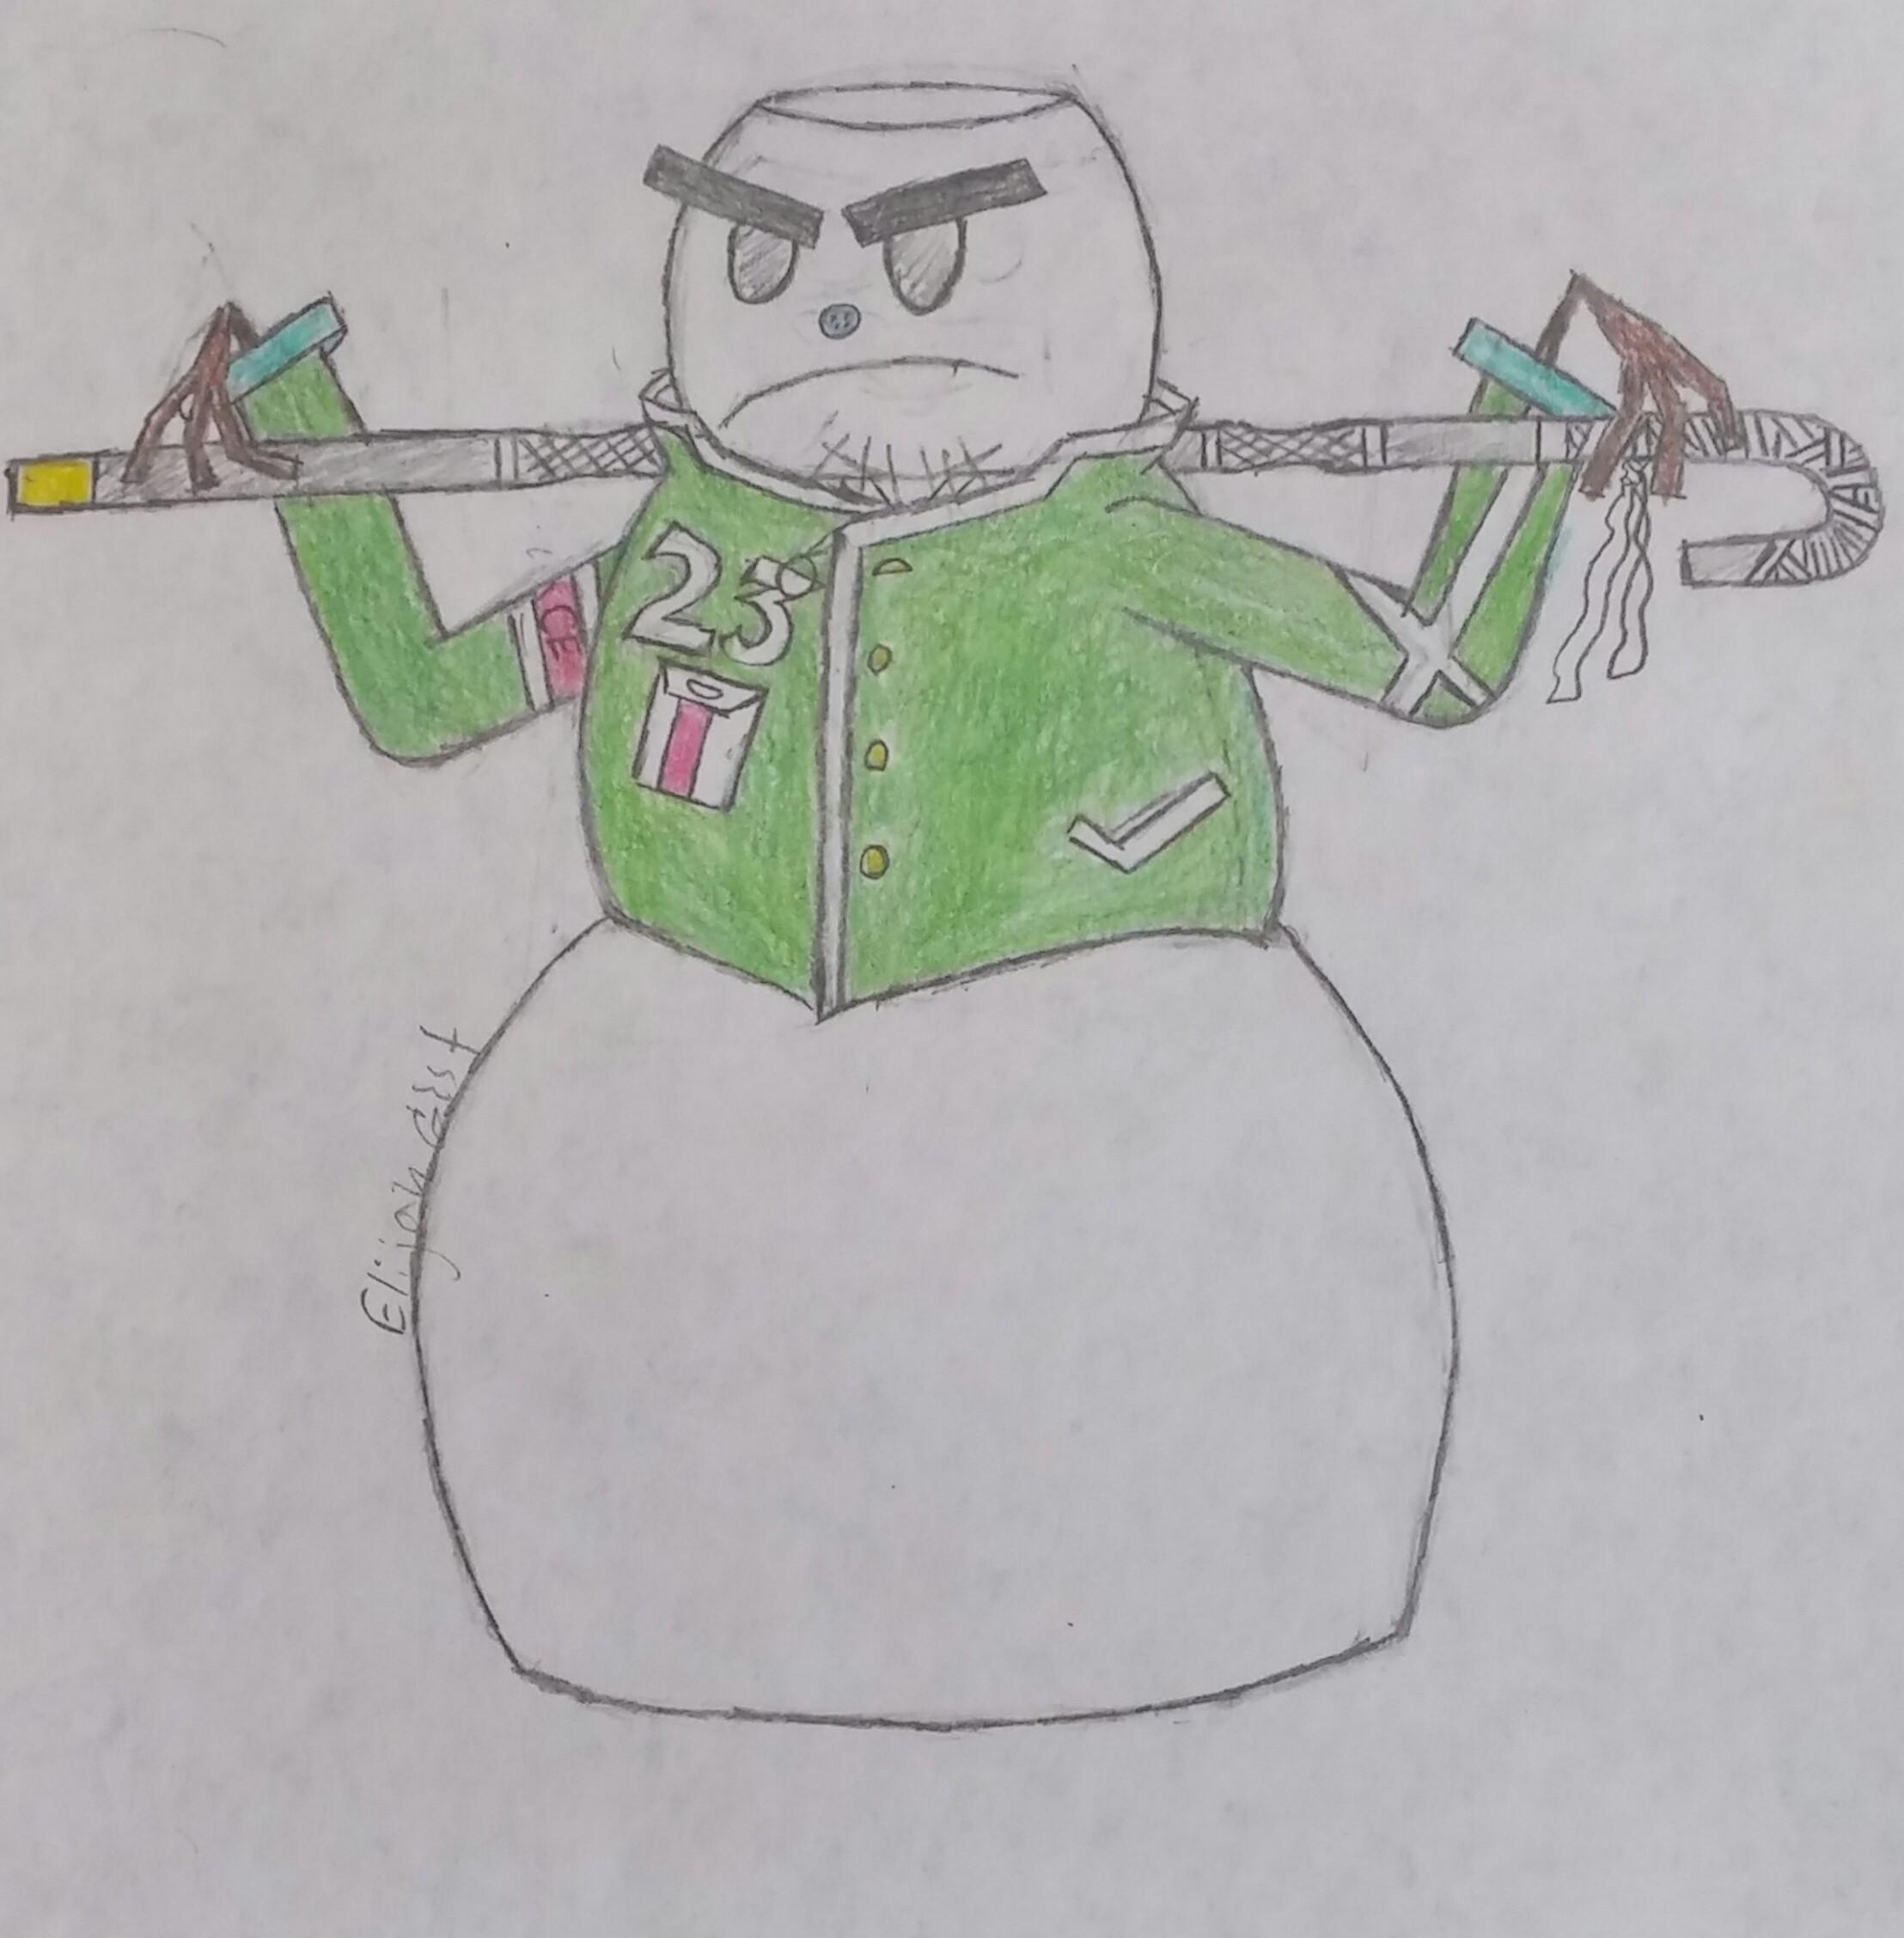 Mr.23 (the snowman)